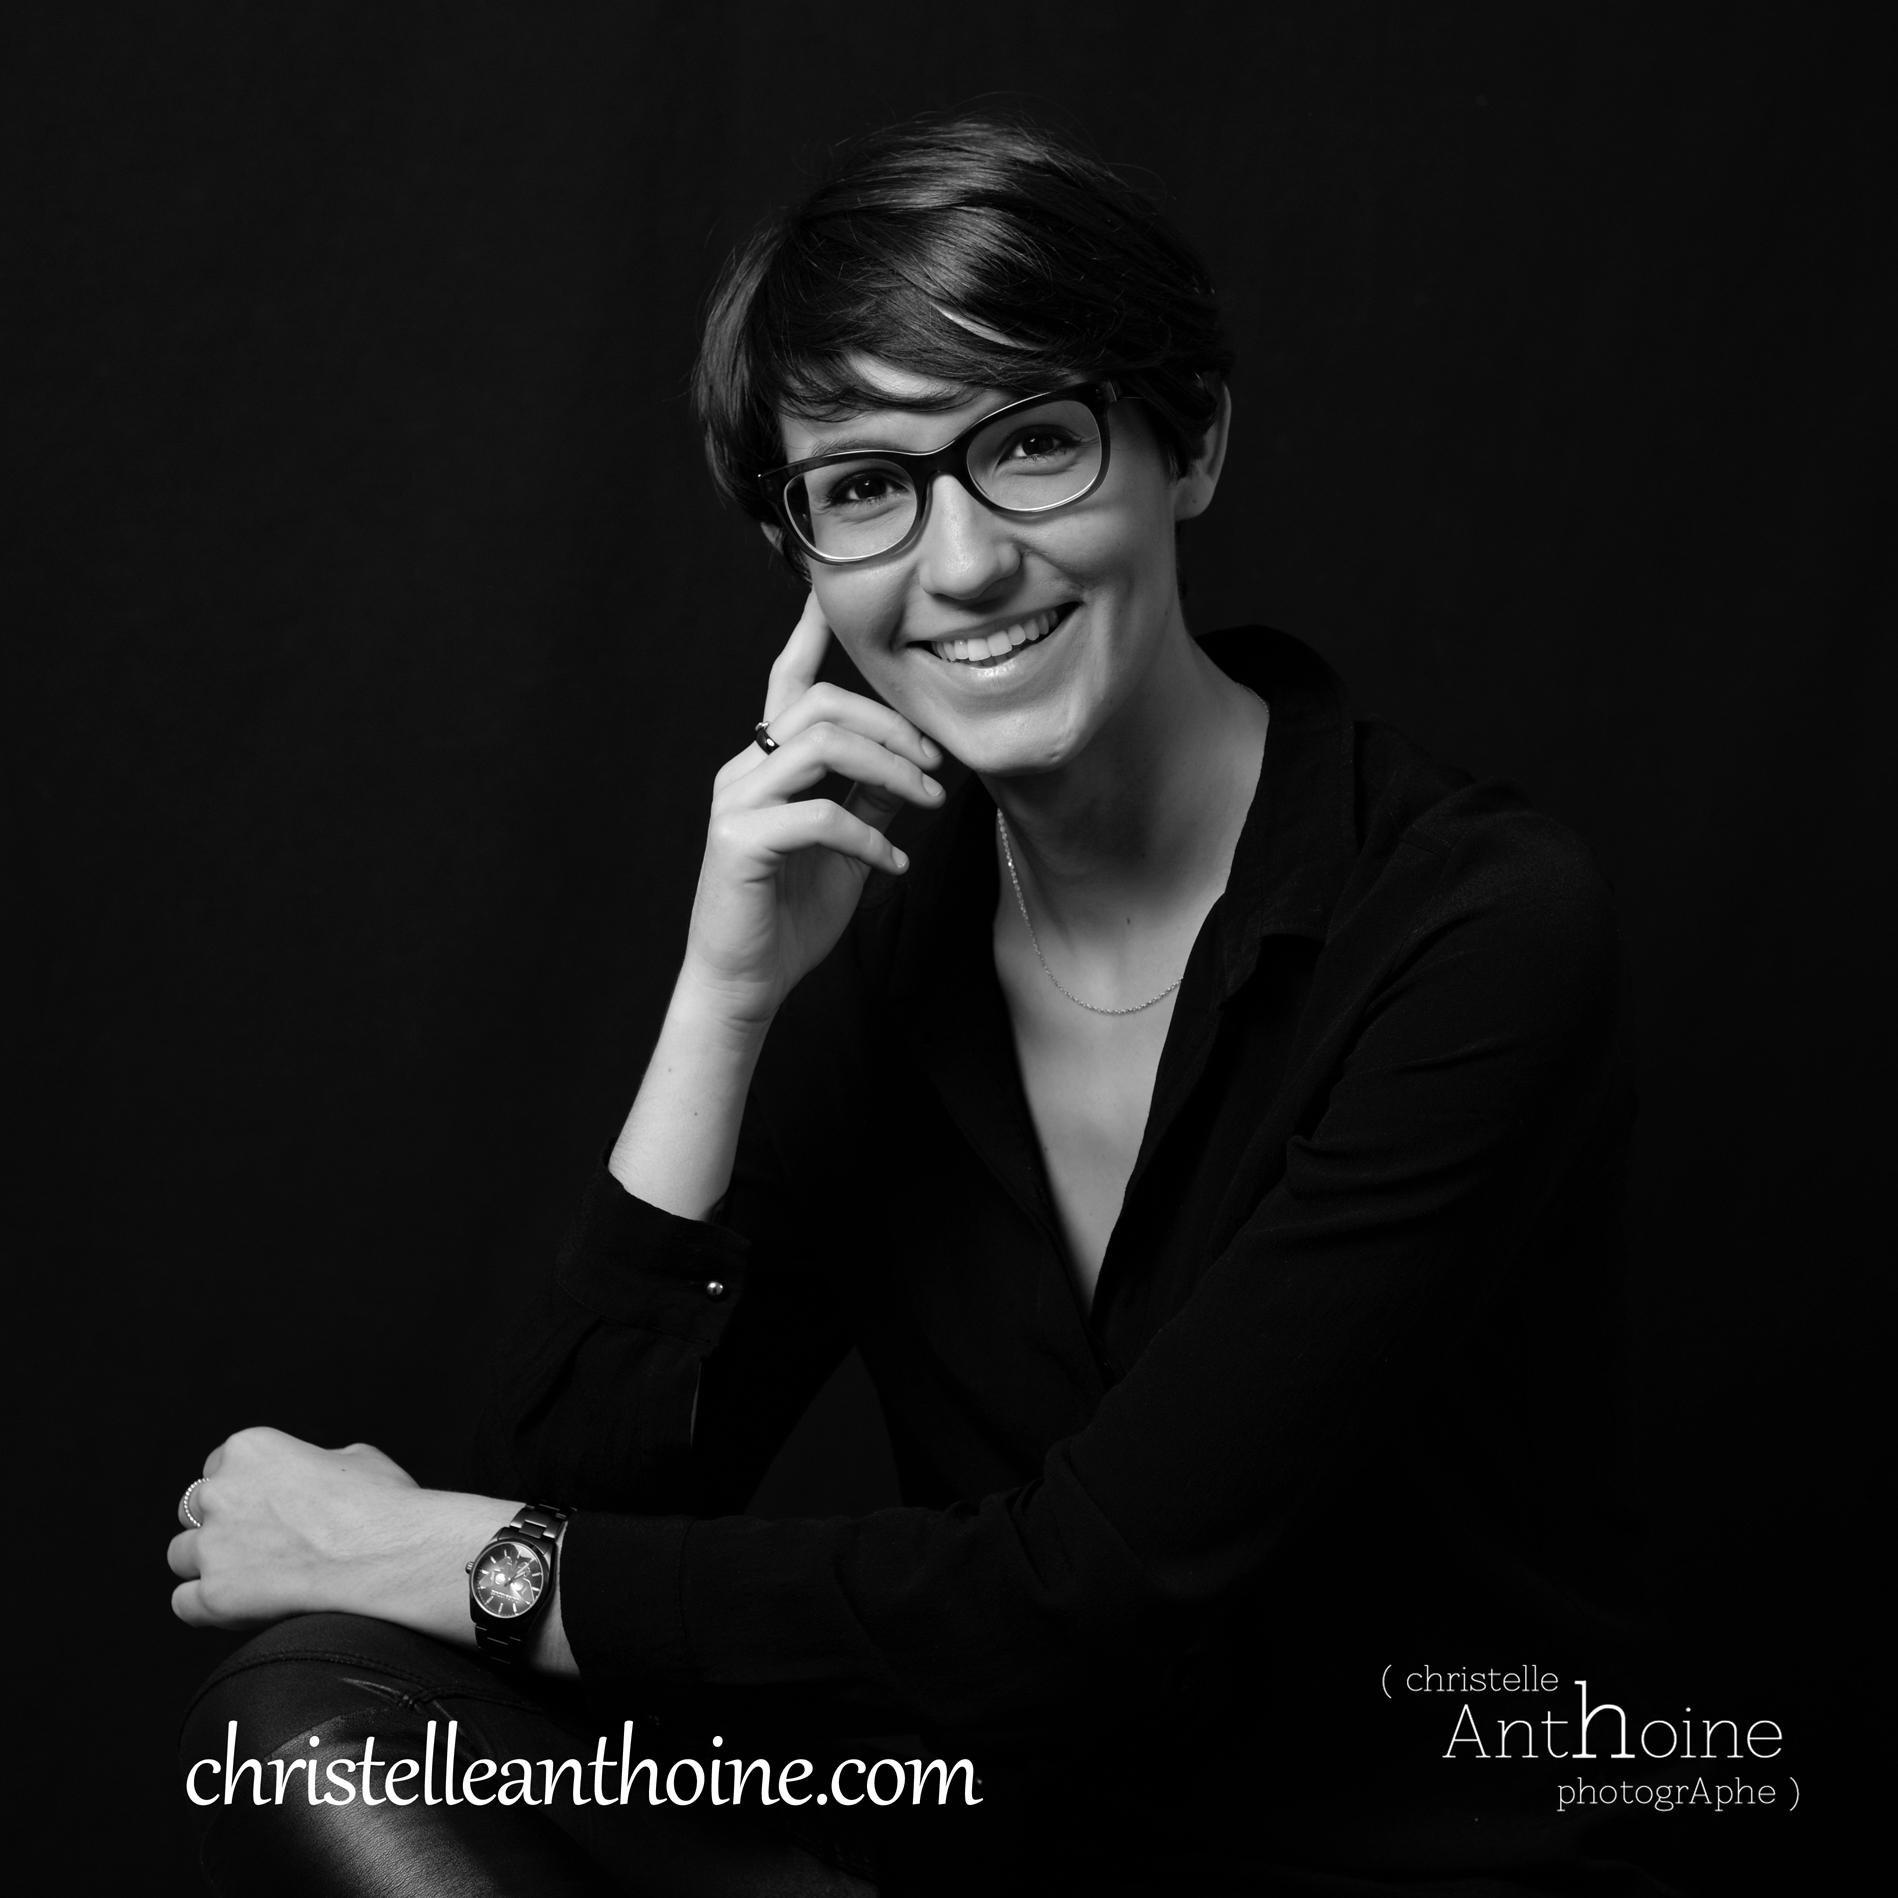 christelle-anthoine-photographe-corporate-nb-bretagne-cotes-darmor